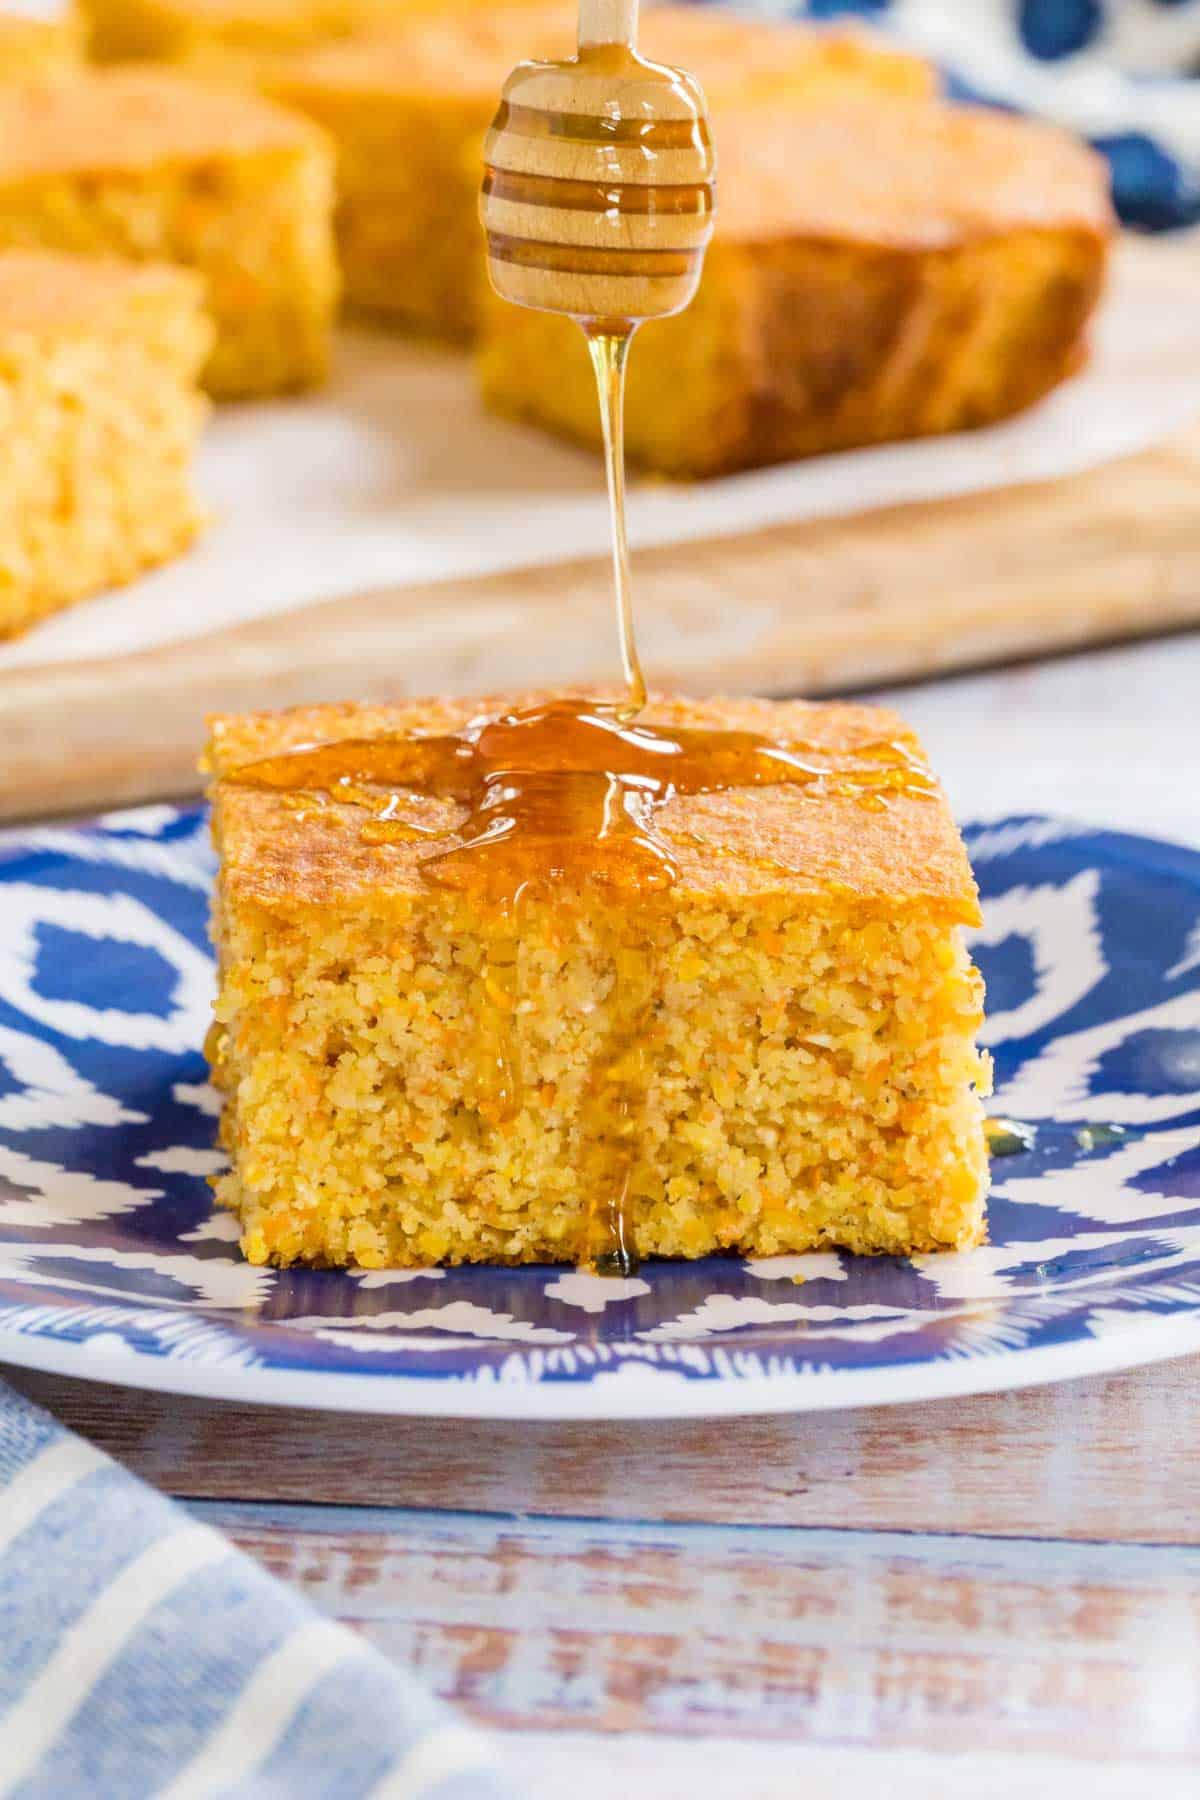 drizzling honey on a slice of cornbread